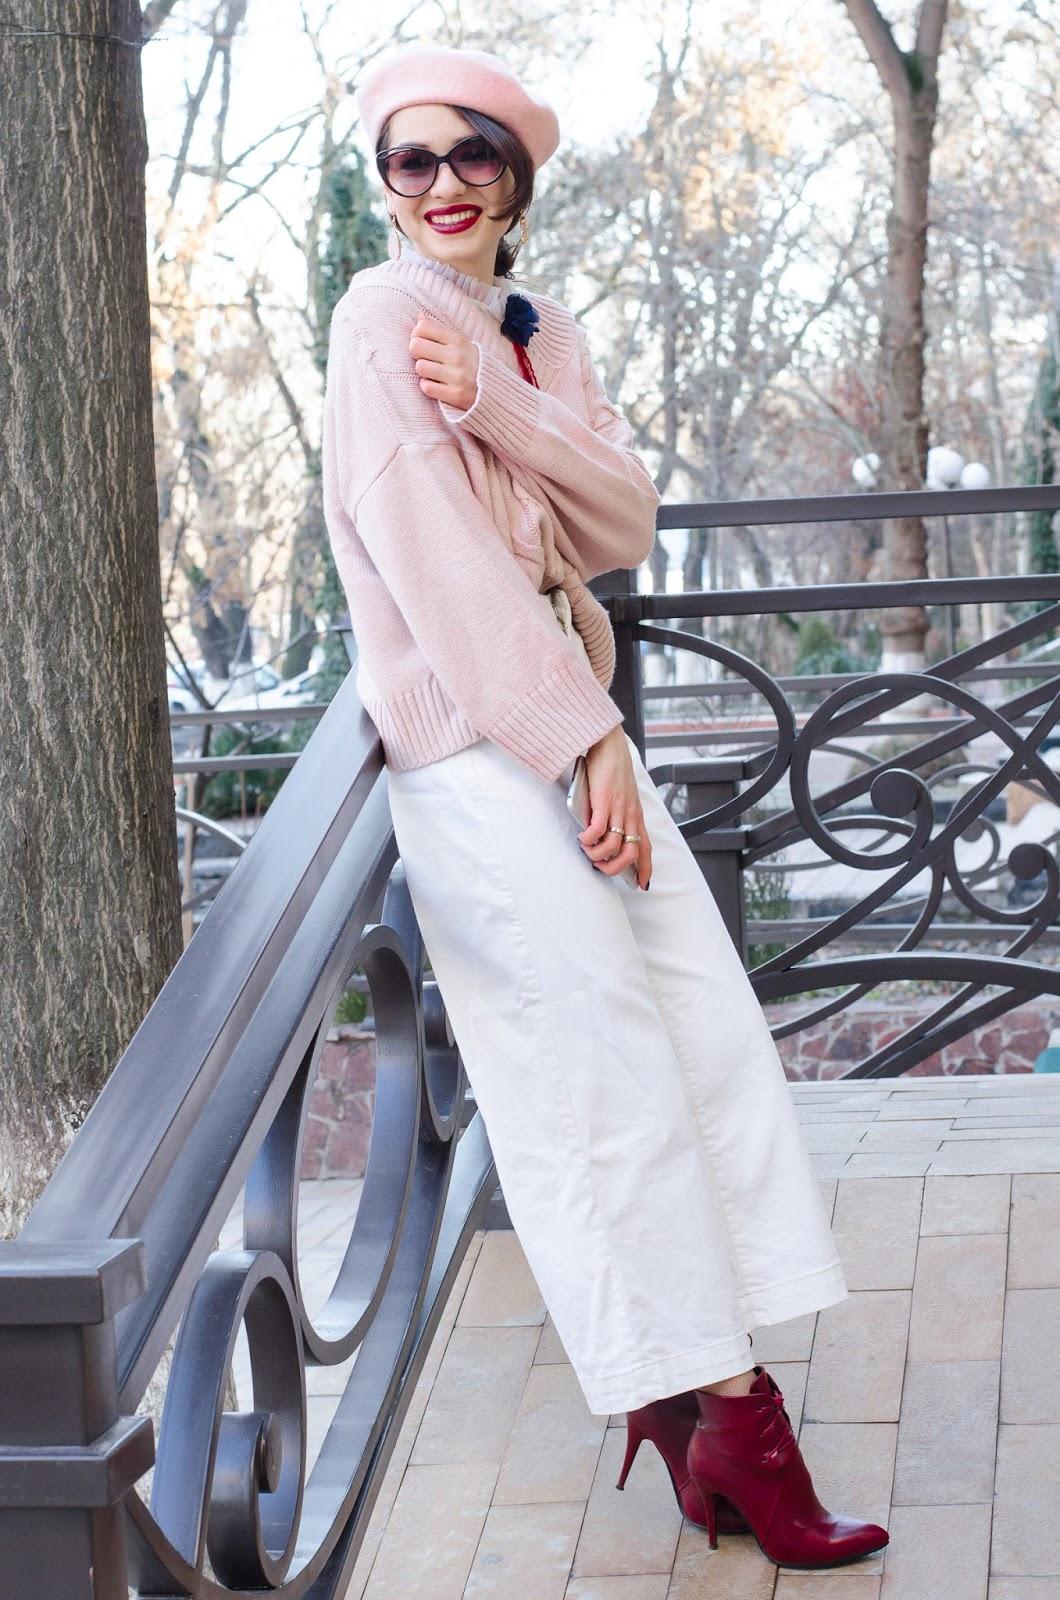 fashion blogger diyorasnotes white cullotes zara pink jumper beret paris style